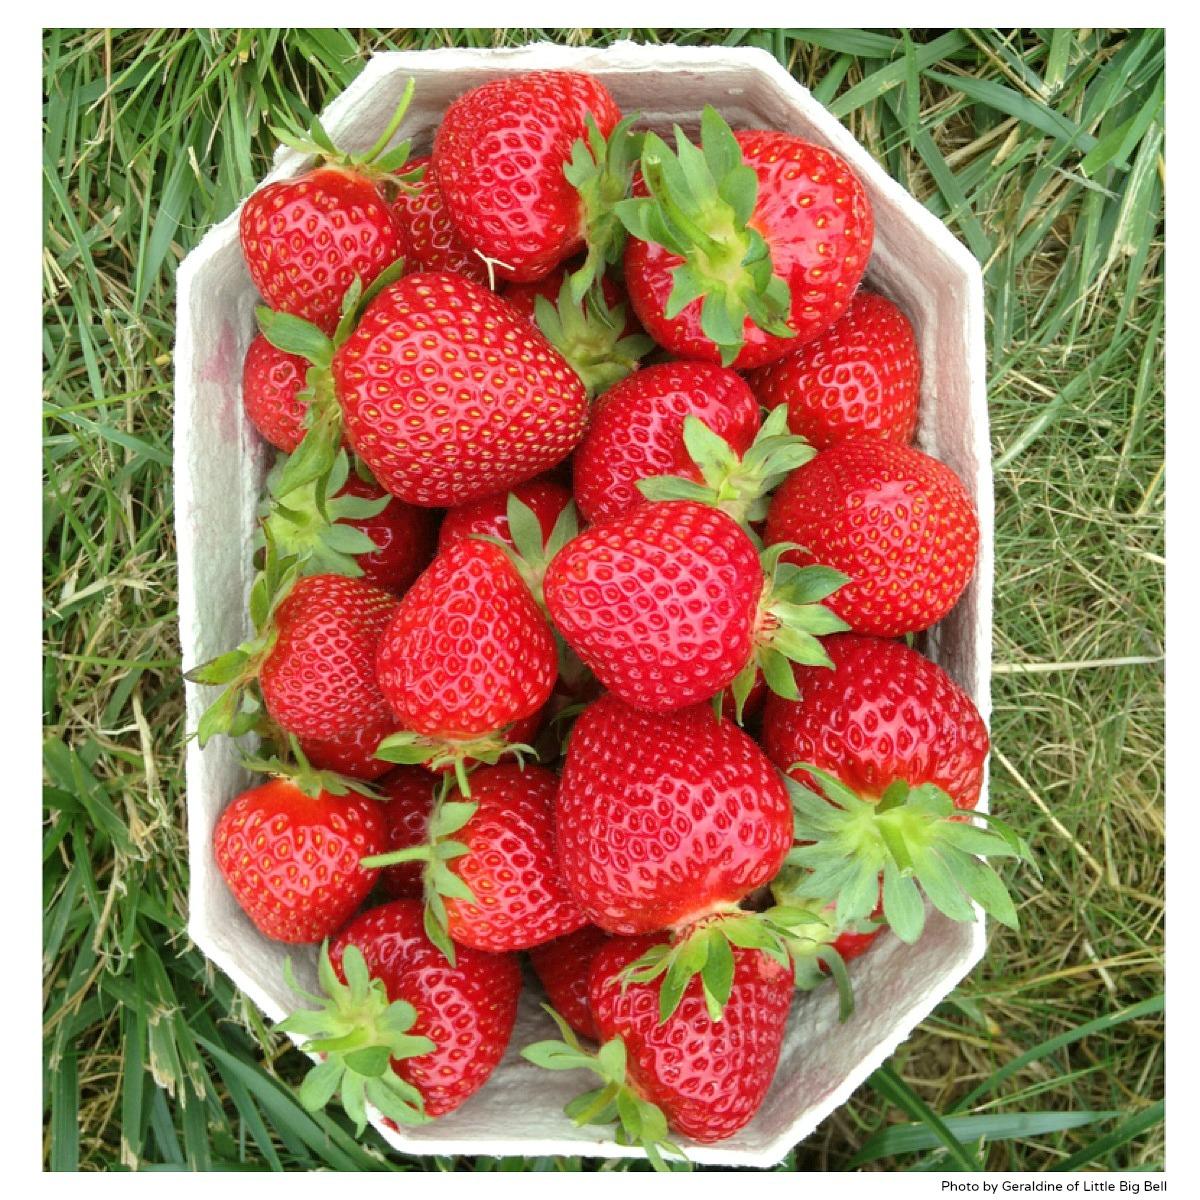 Strawberries-Daylesford-organic-farm